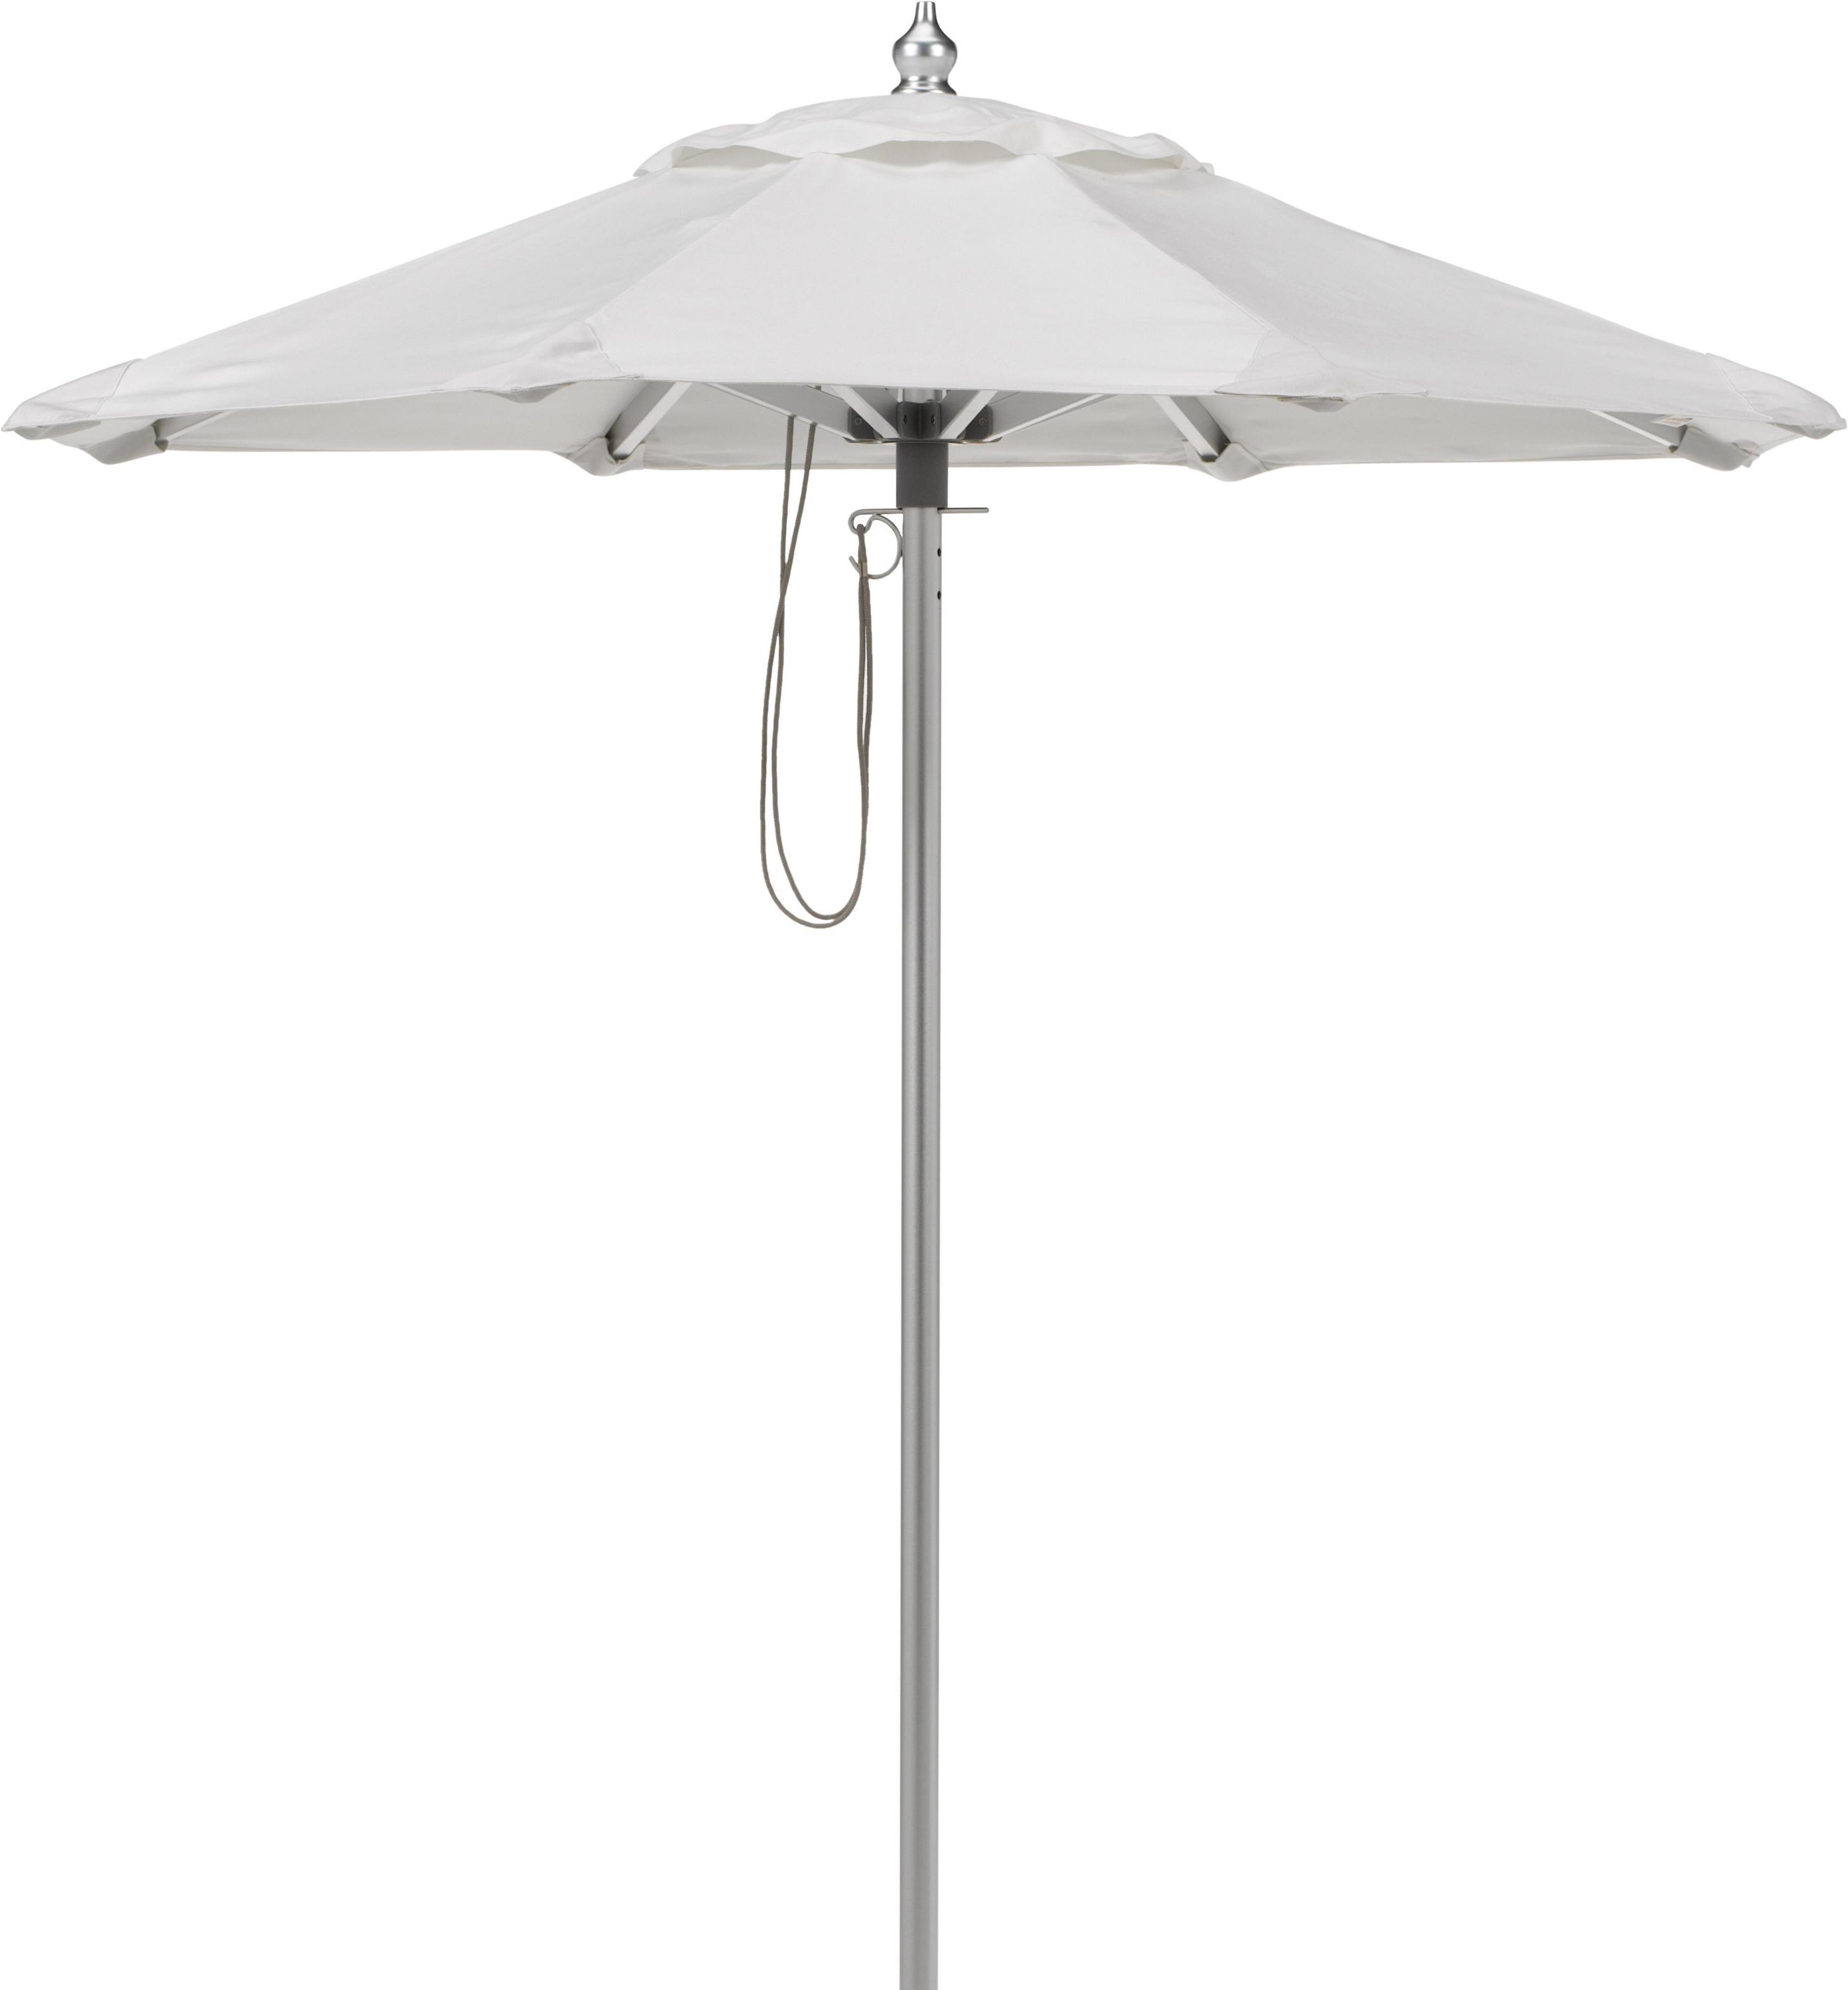 Most Recent Caravelle Market Umbrellas Intended For Stambaugh 6' Market Umbrella (View 19 of 20)